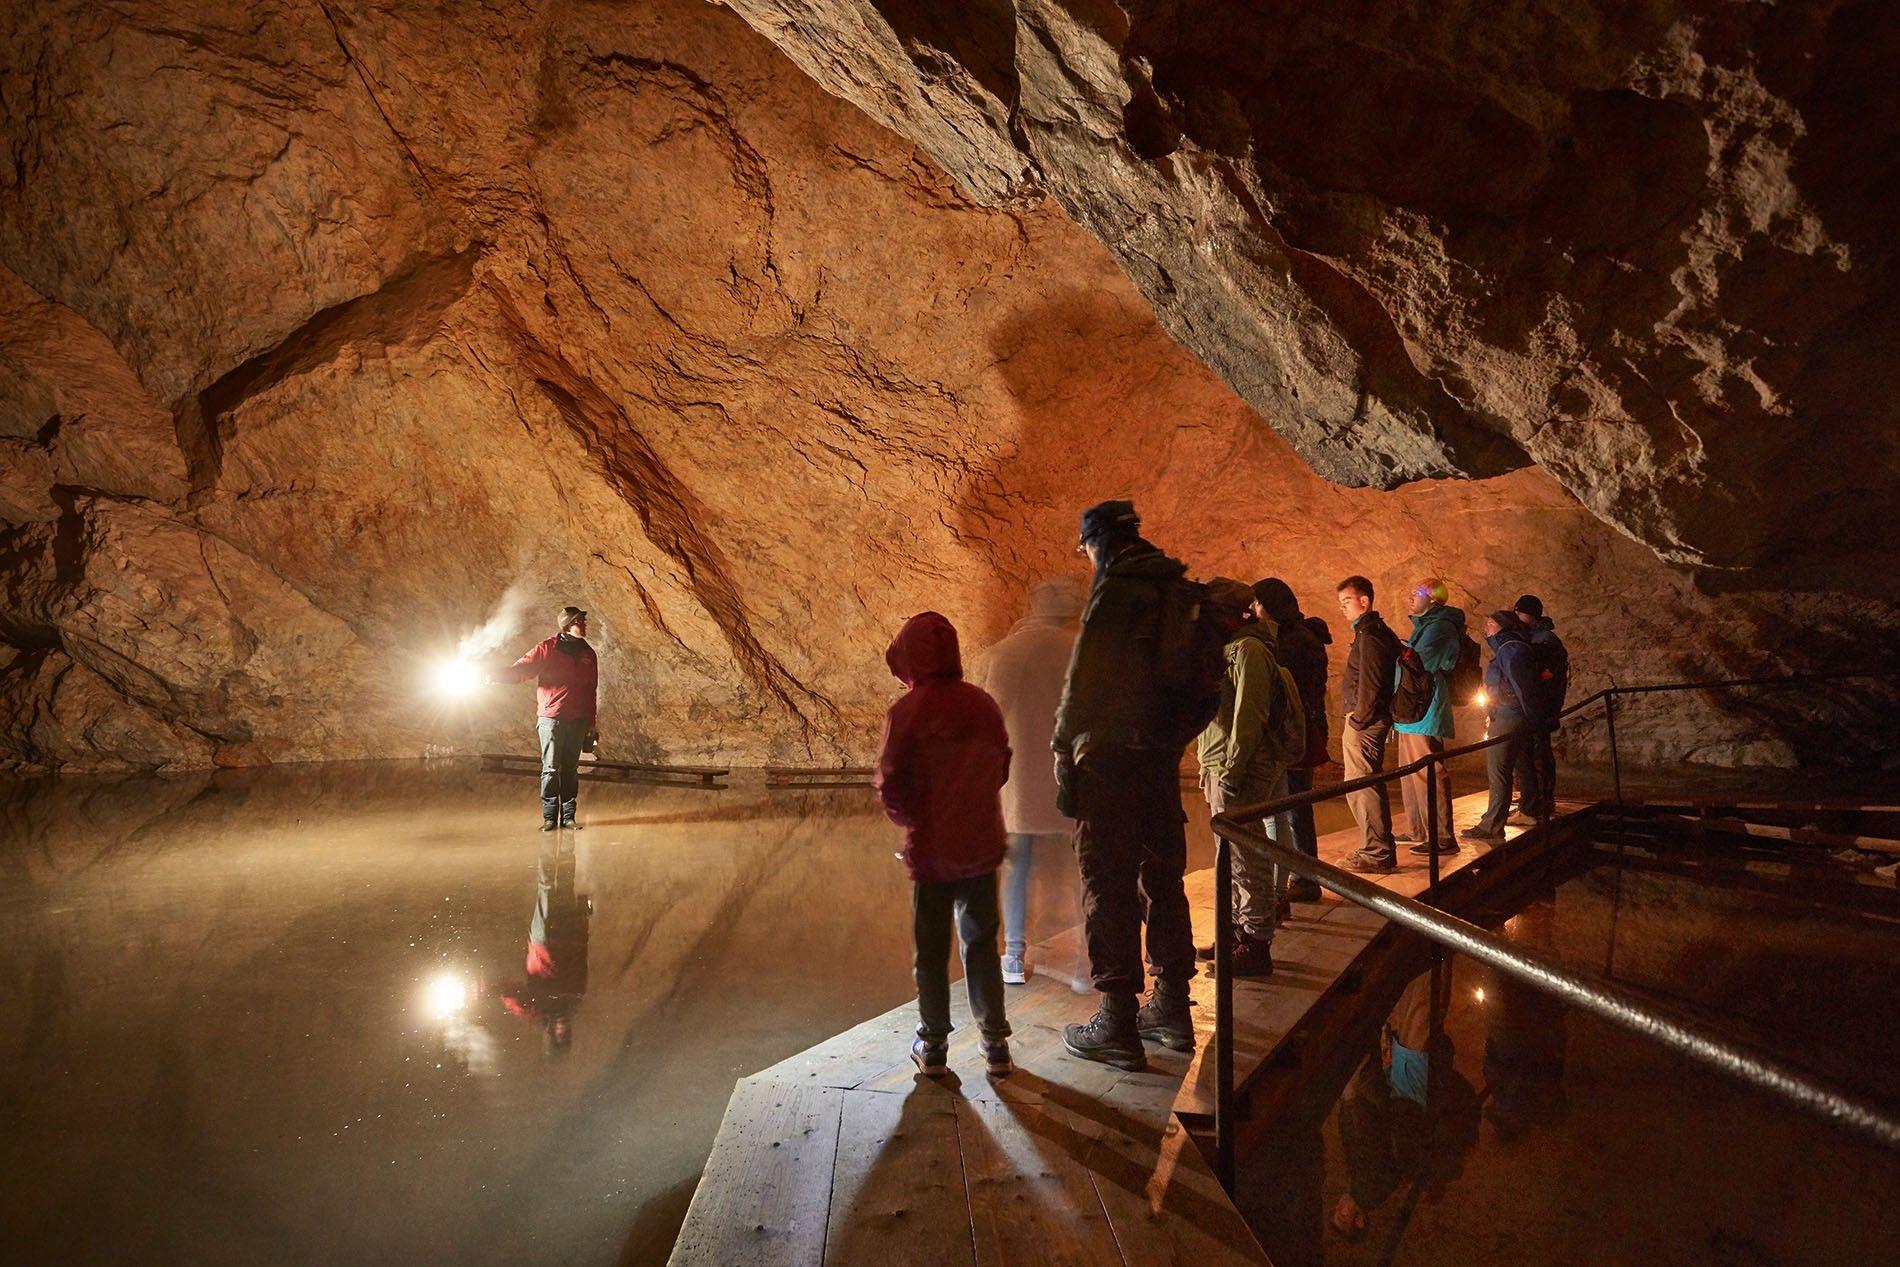 Touring the Eisriesenwelt ice cave within Hochkogel mountain